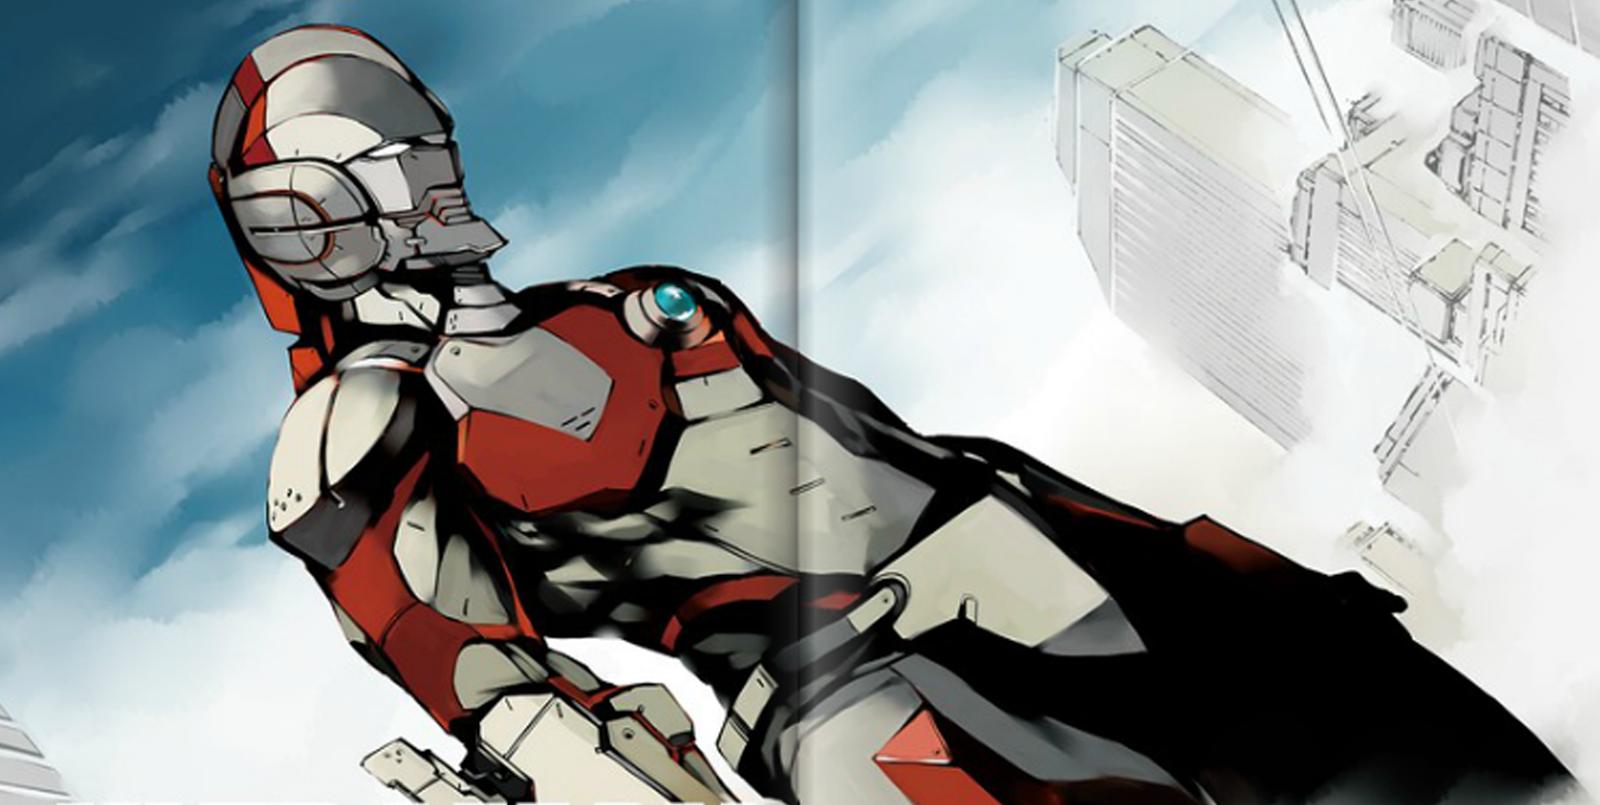 Ultraman Manga To Make Major Announcement.